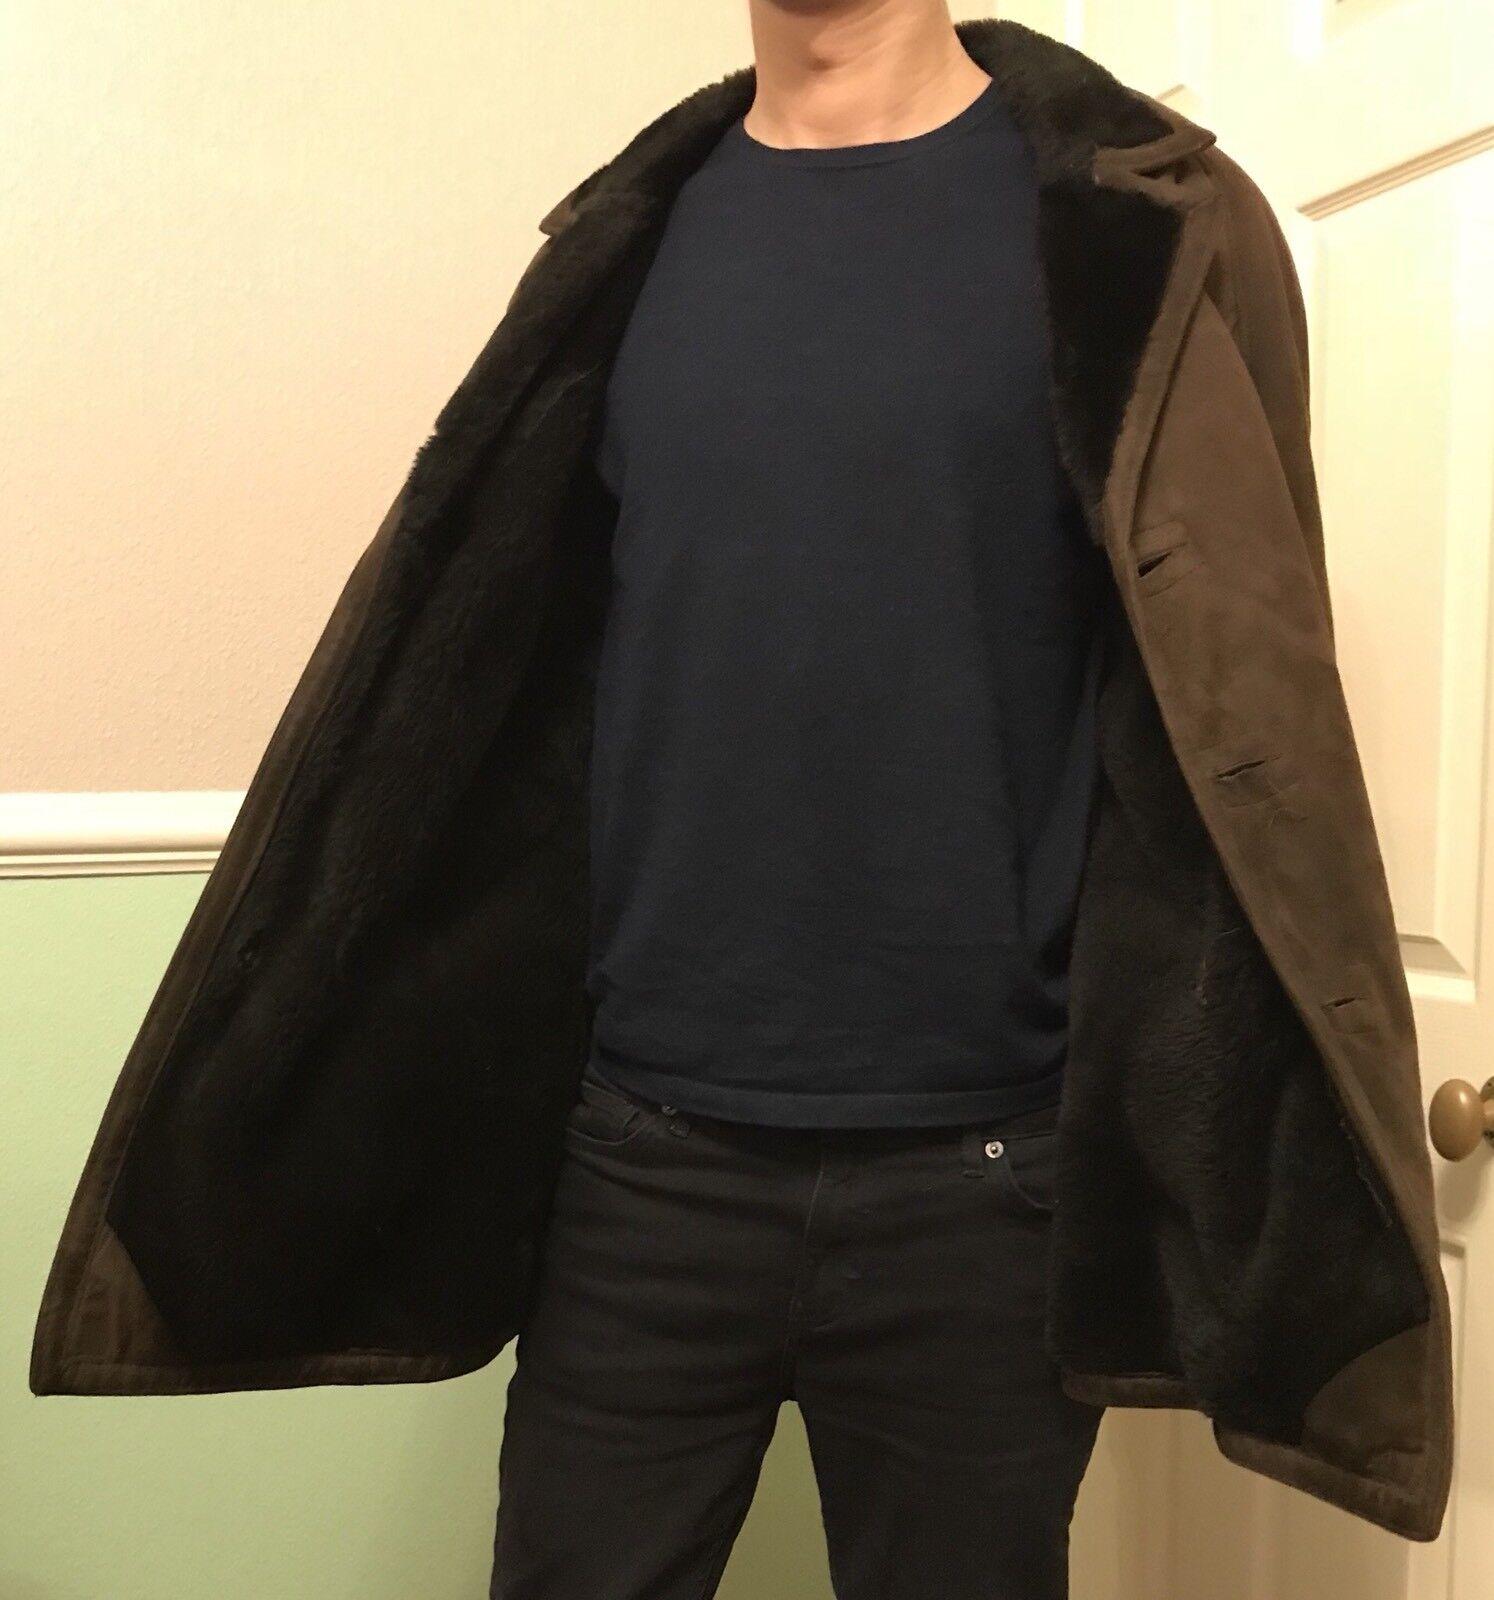 Vintage Férfi Báránybőr